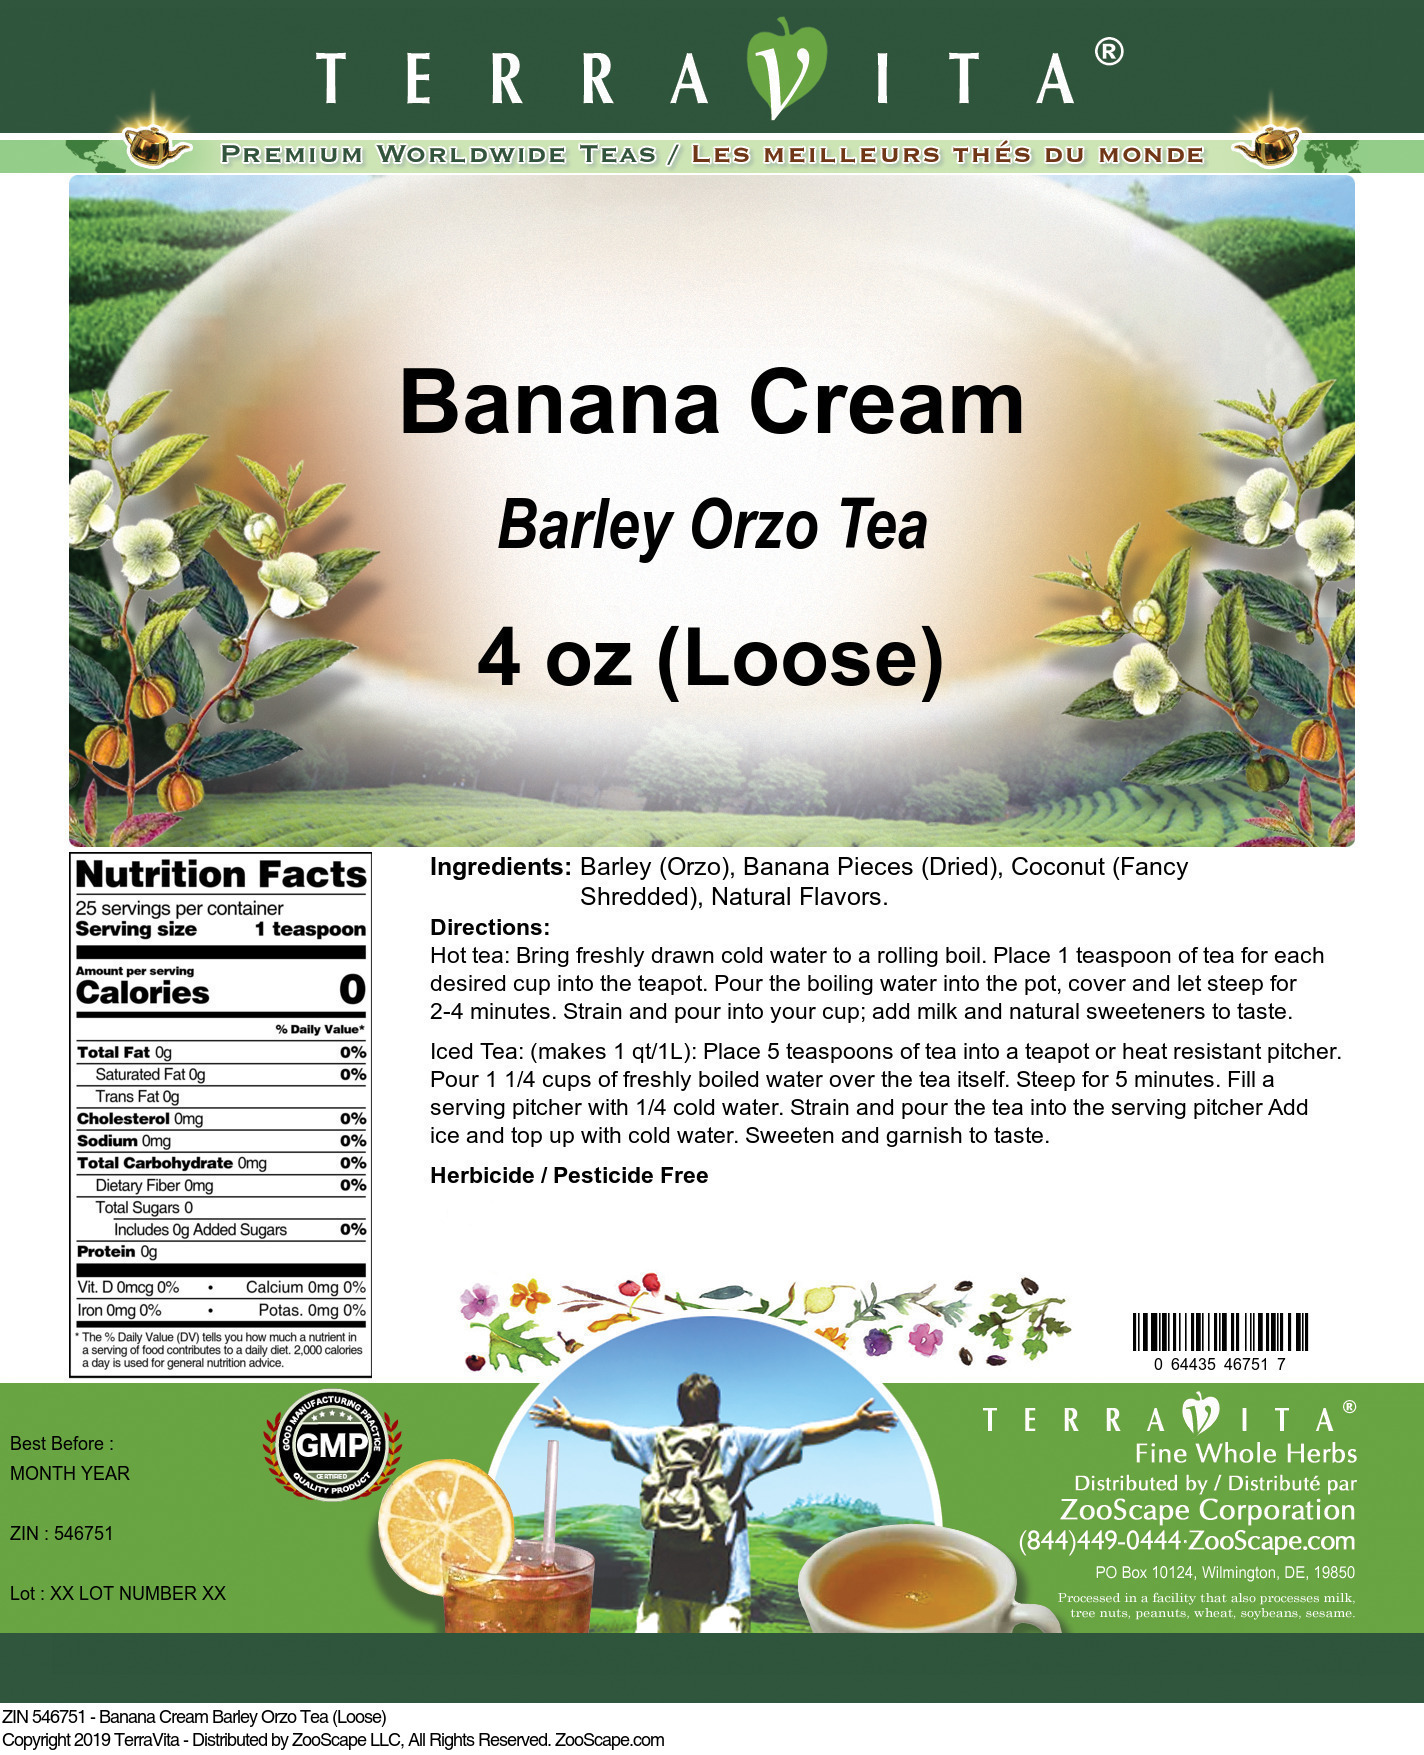 Banana Cream Barley Orzo Tea (Loose)